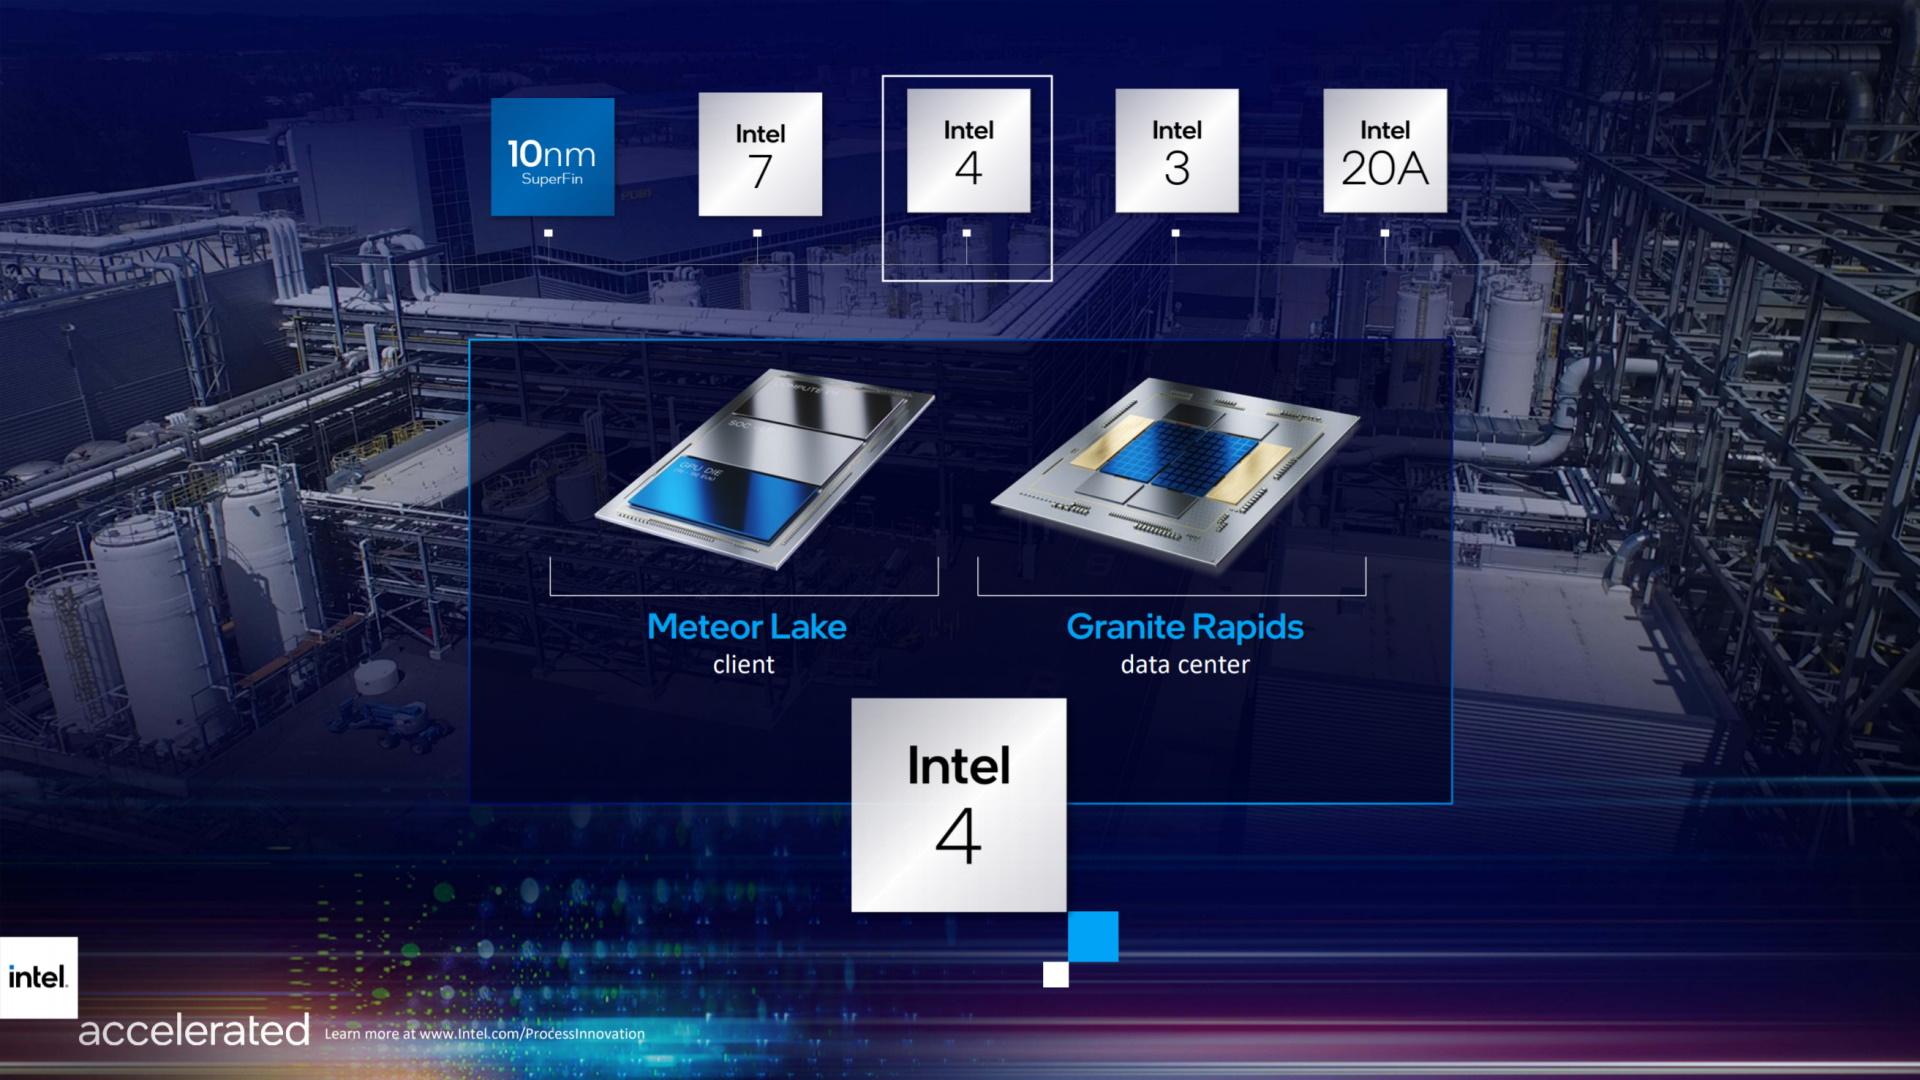 Intel Meteor Lake will use the Intel 4 process